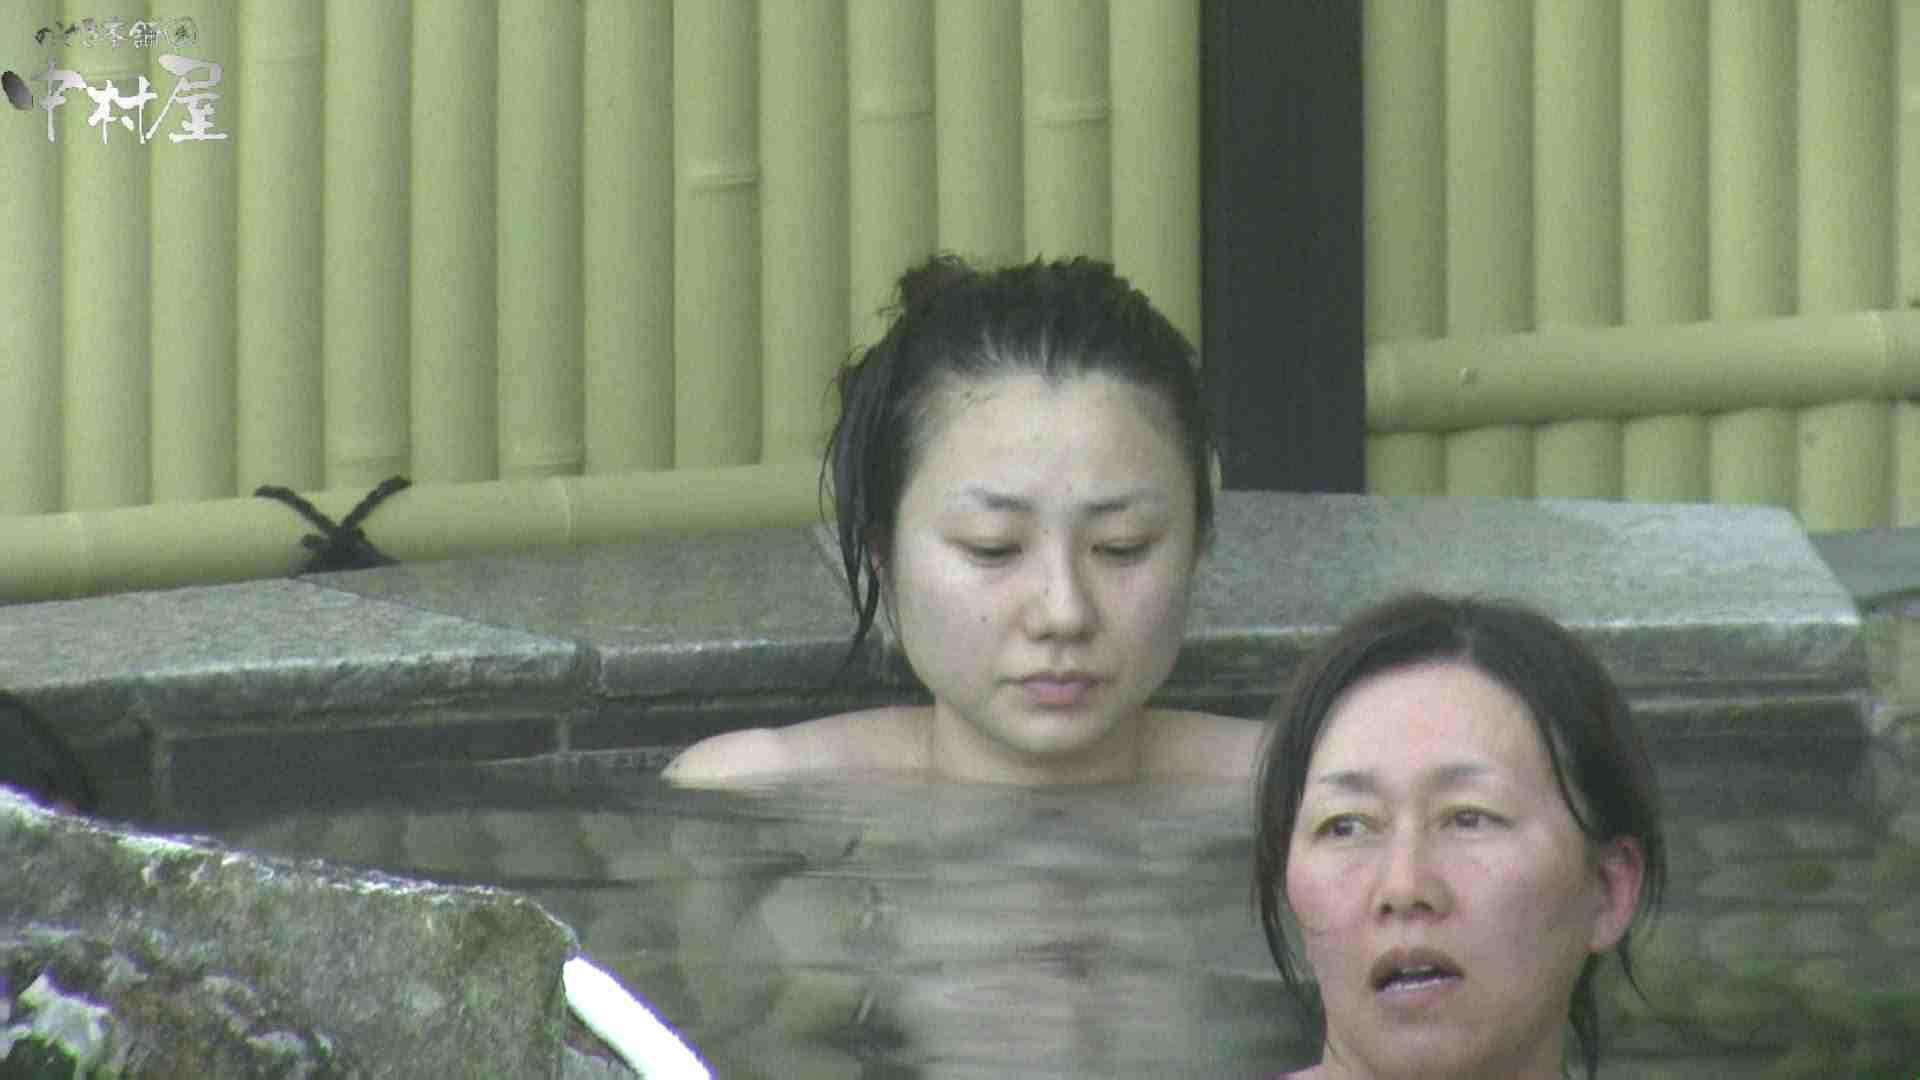 Aquaな露天風呂Vol.969 盗撮 | OLセックス  52画像 1